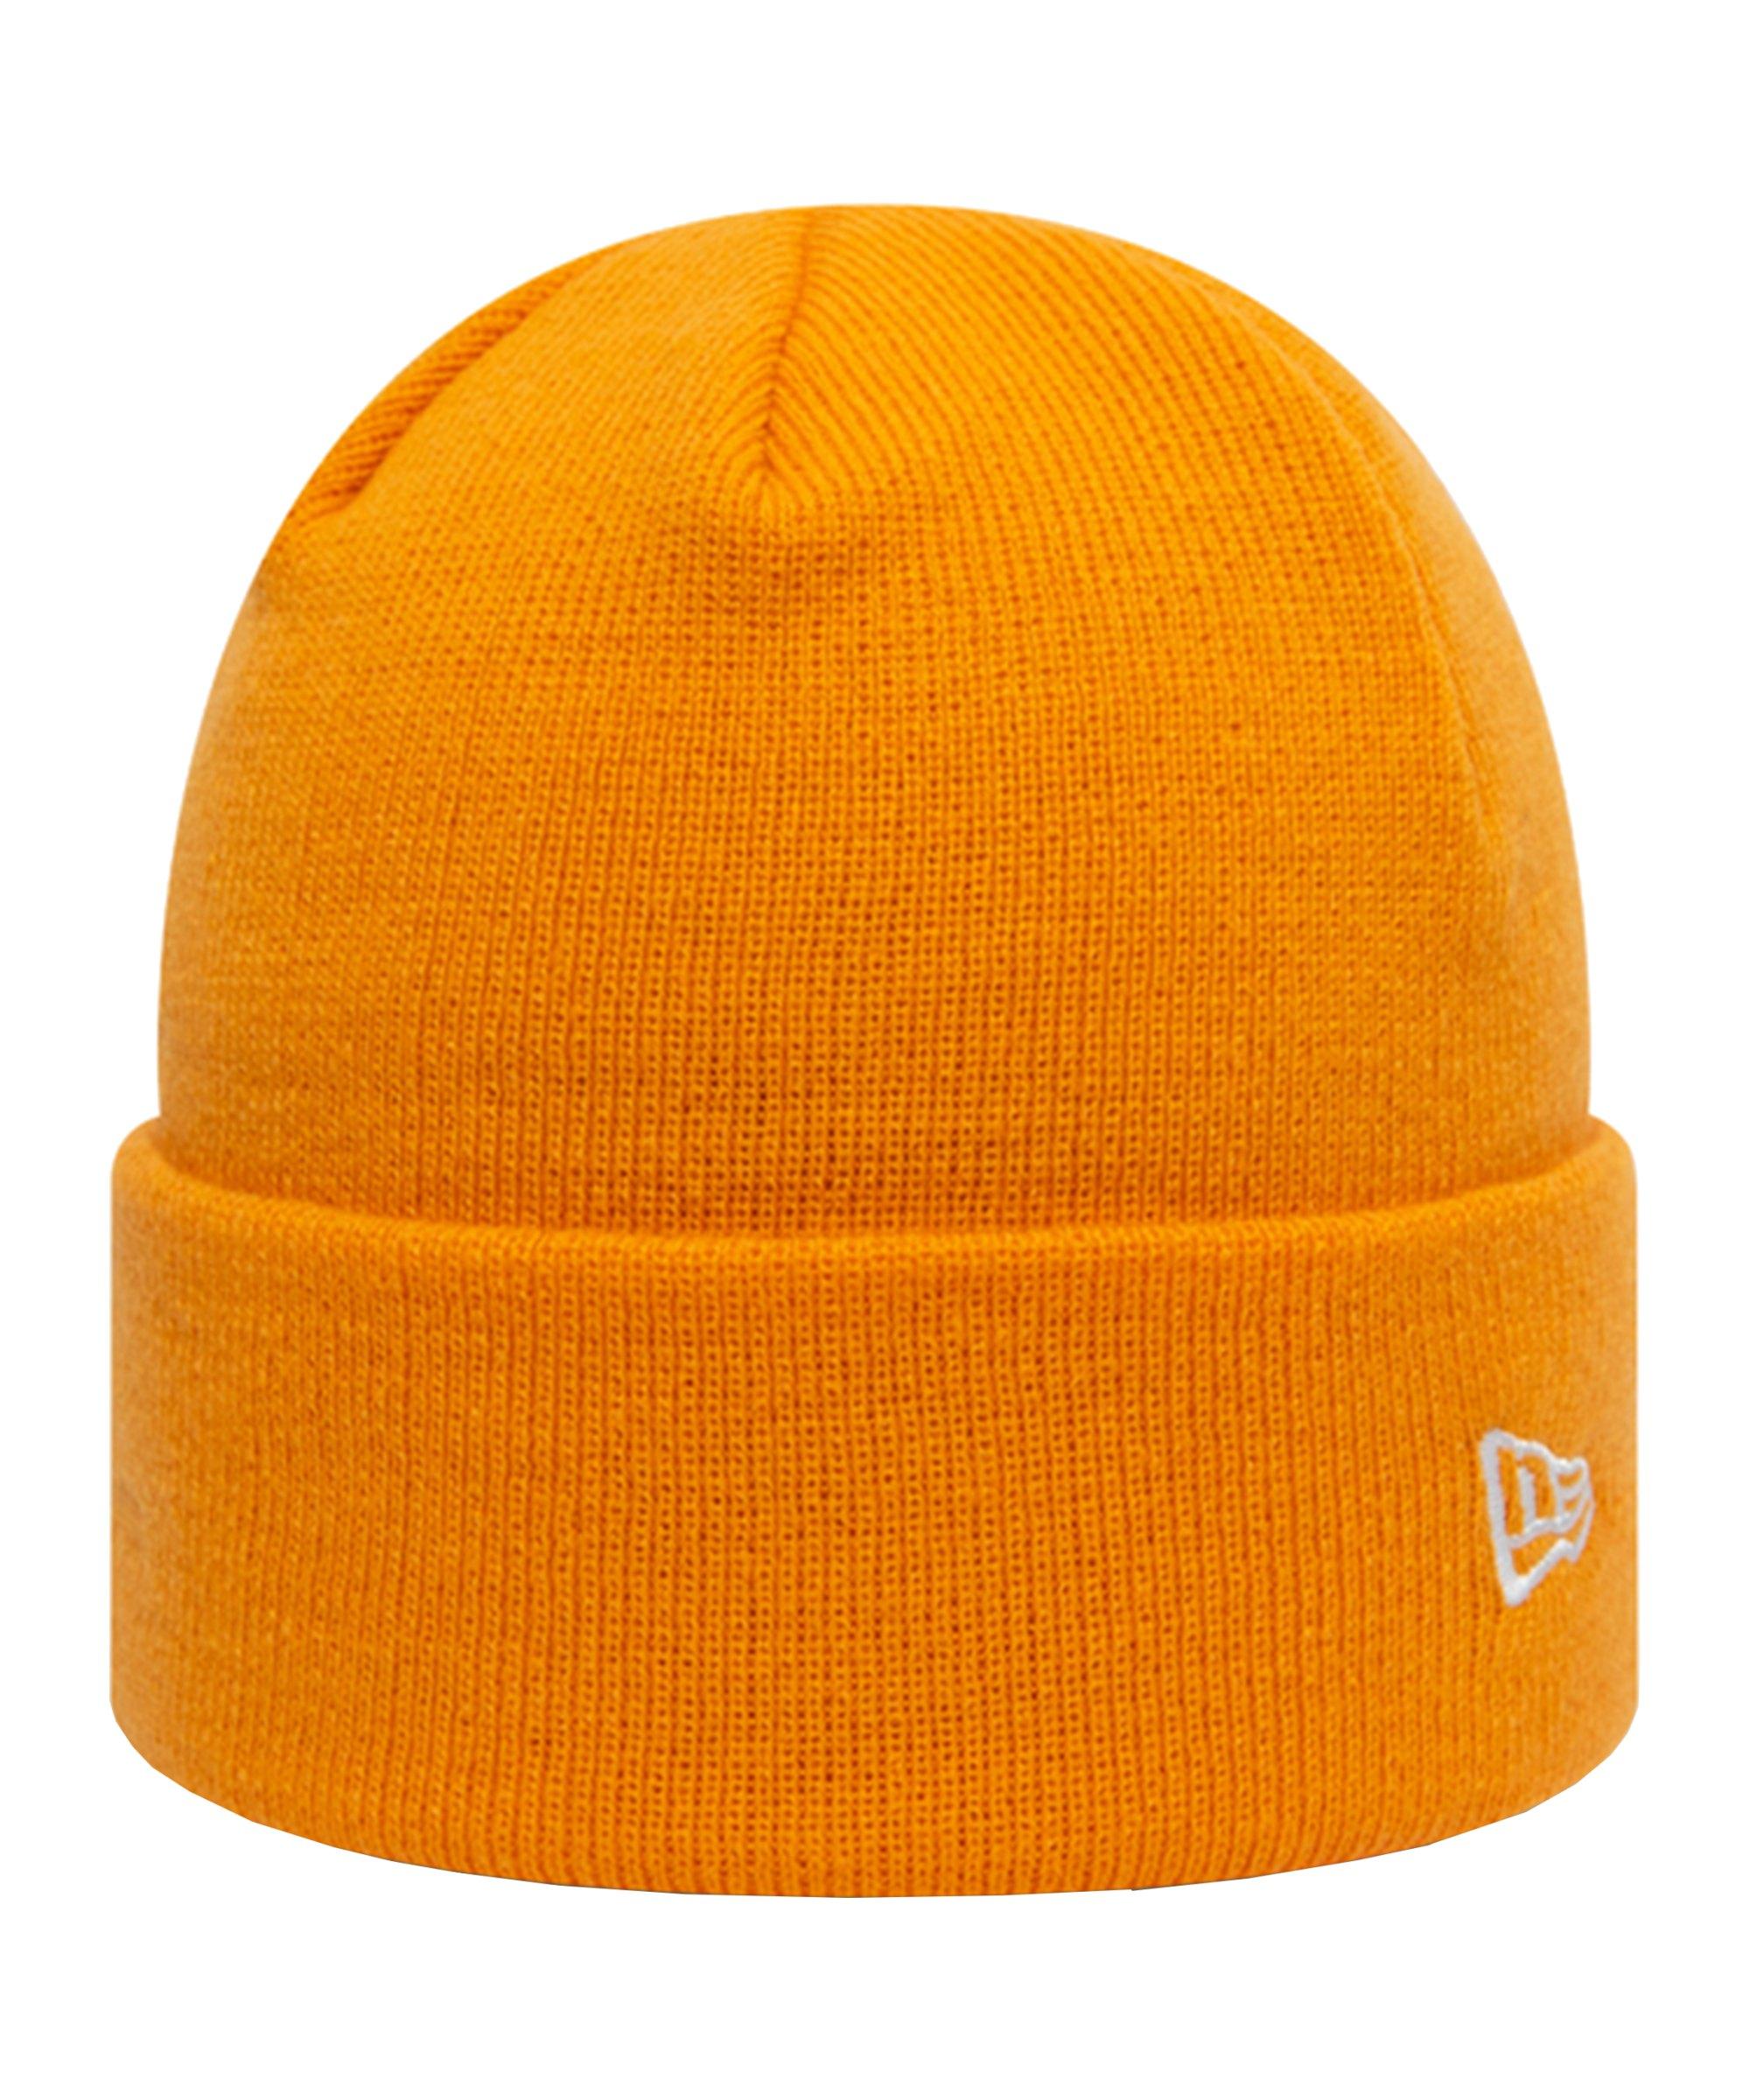 New Era Pop Cuff Knit Short Mütze Orange FTGO - orange